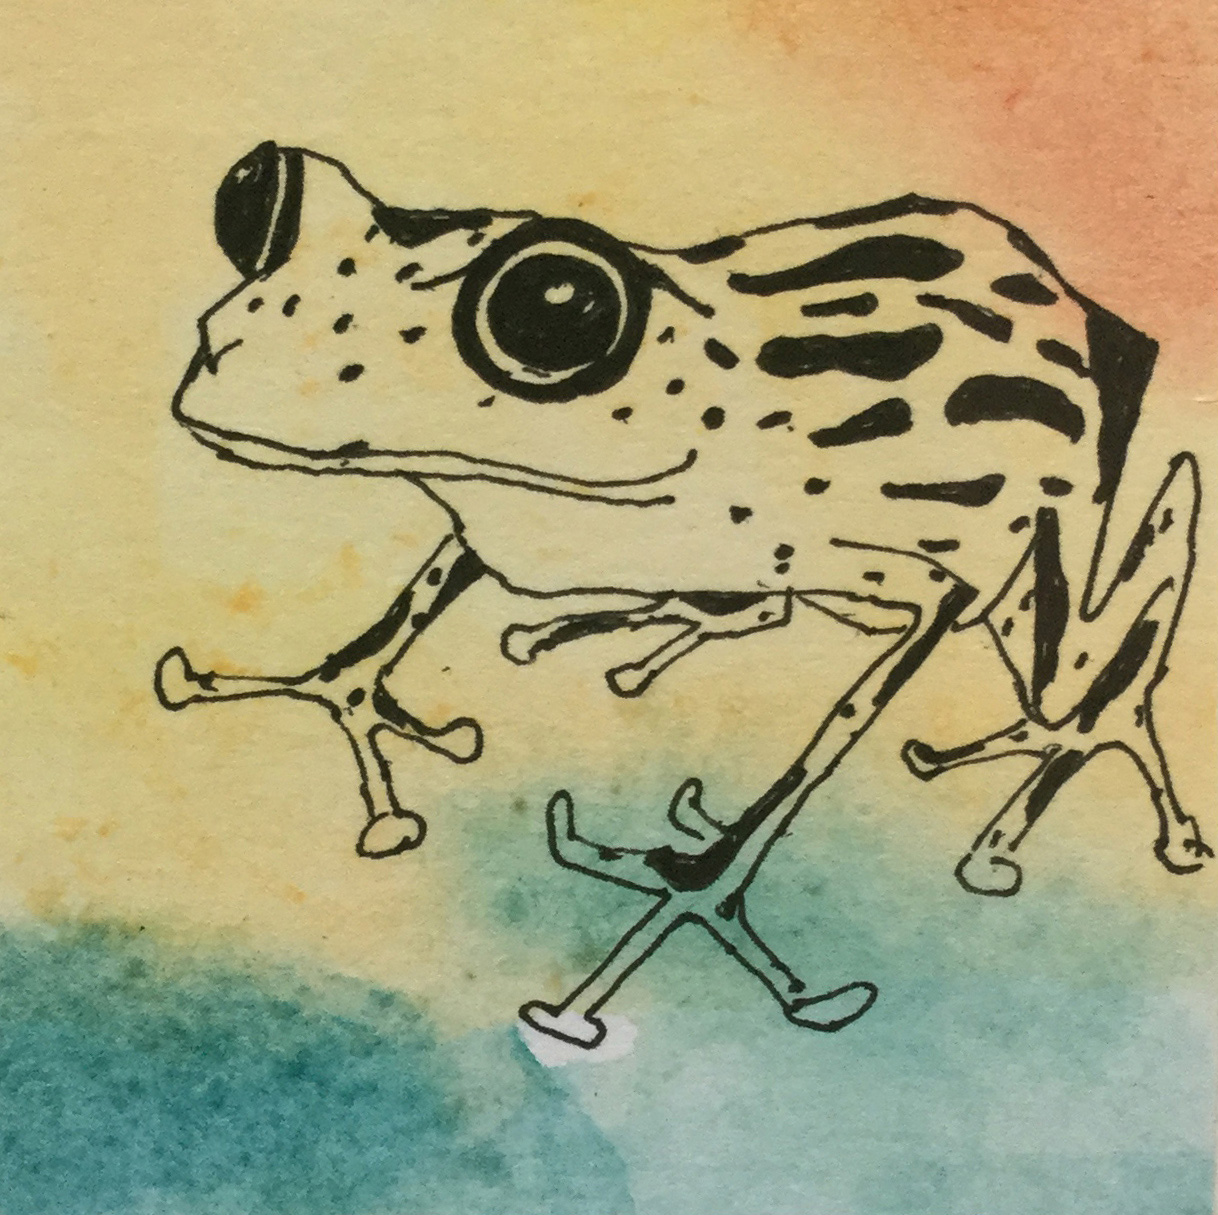 Frog-2-small.jpg